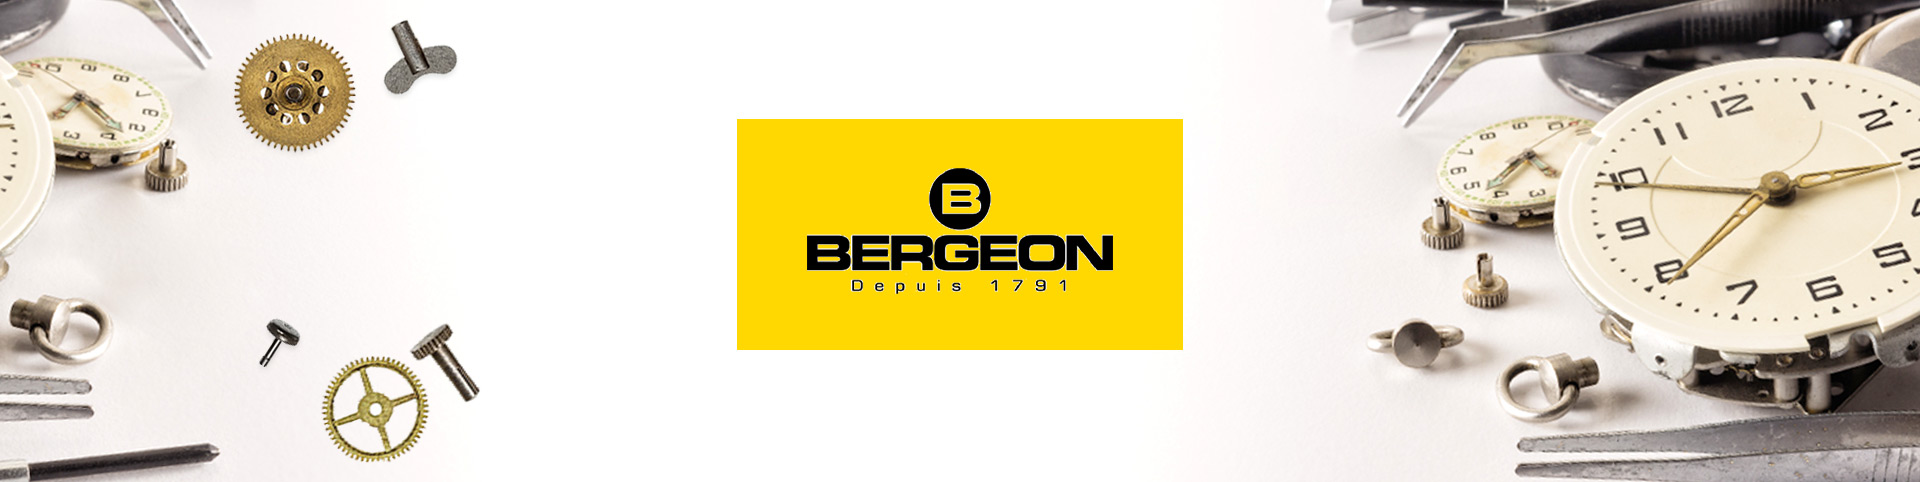 EN_Bergeon